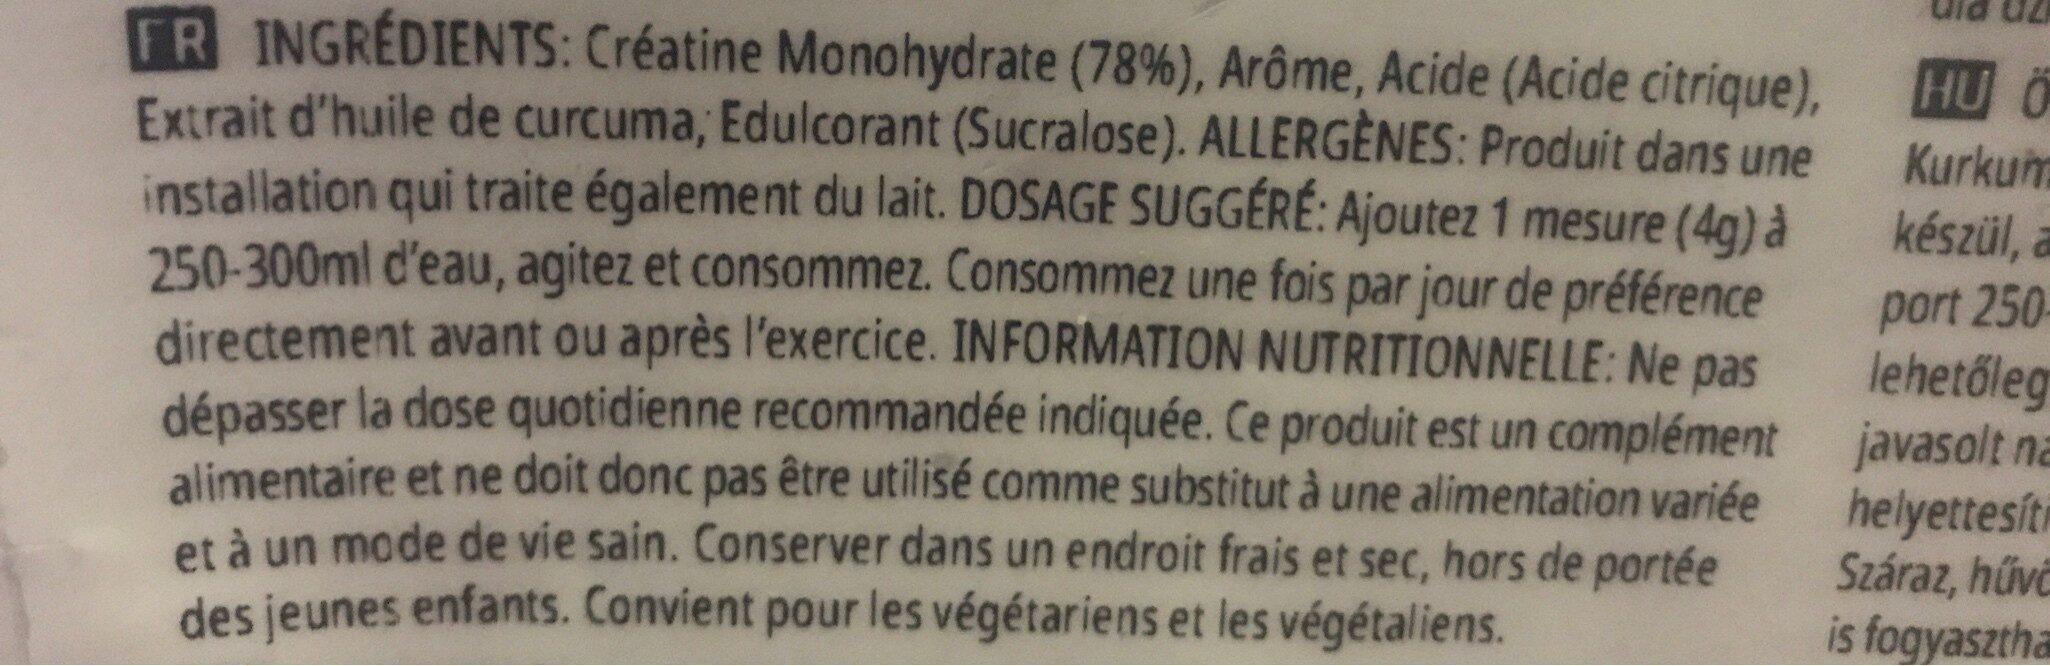 Creatine Monohydrate - Ingredients